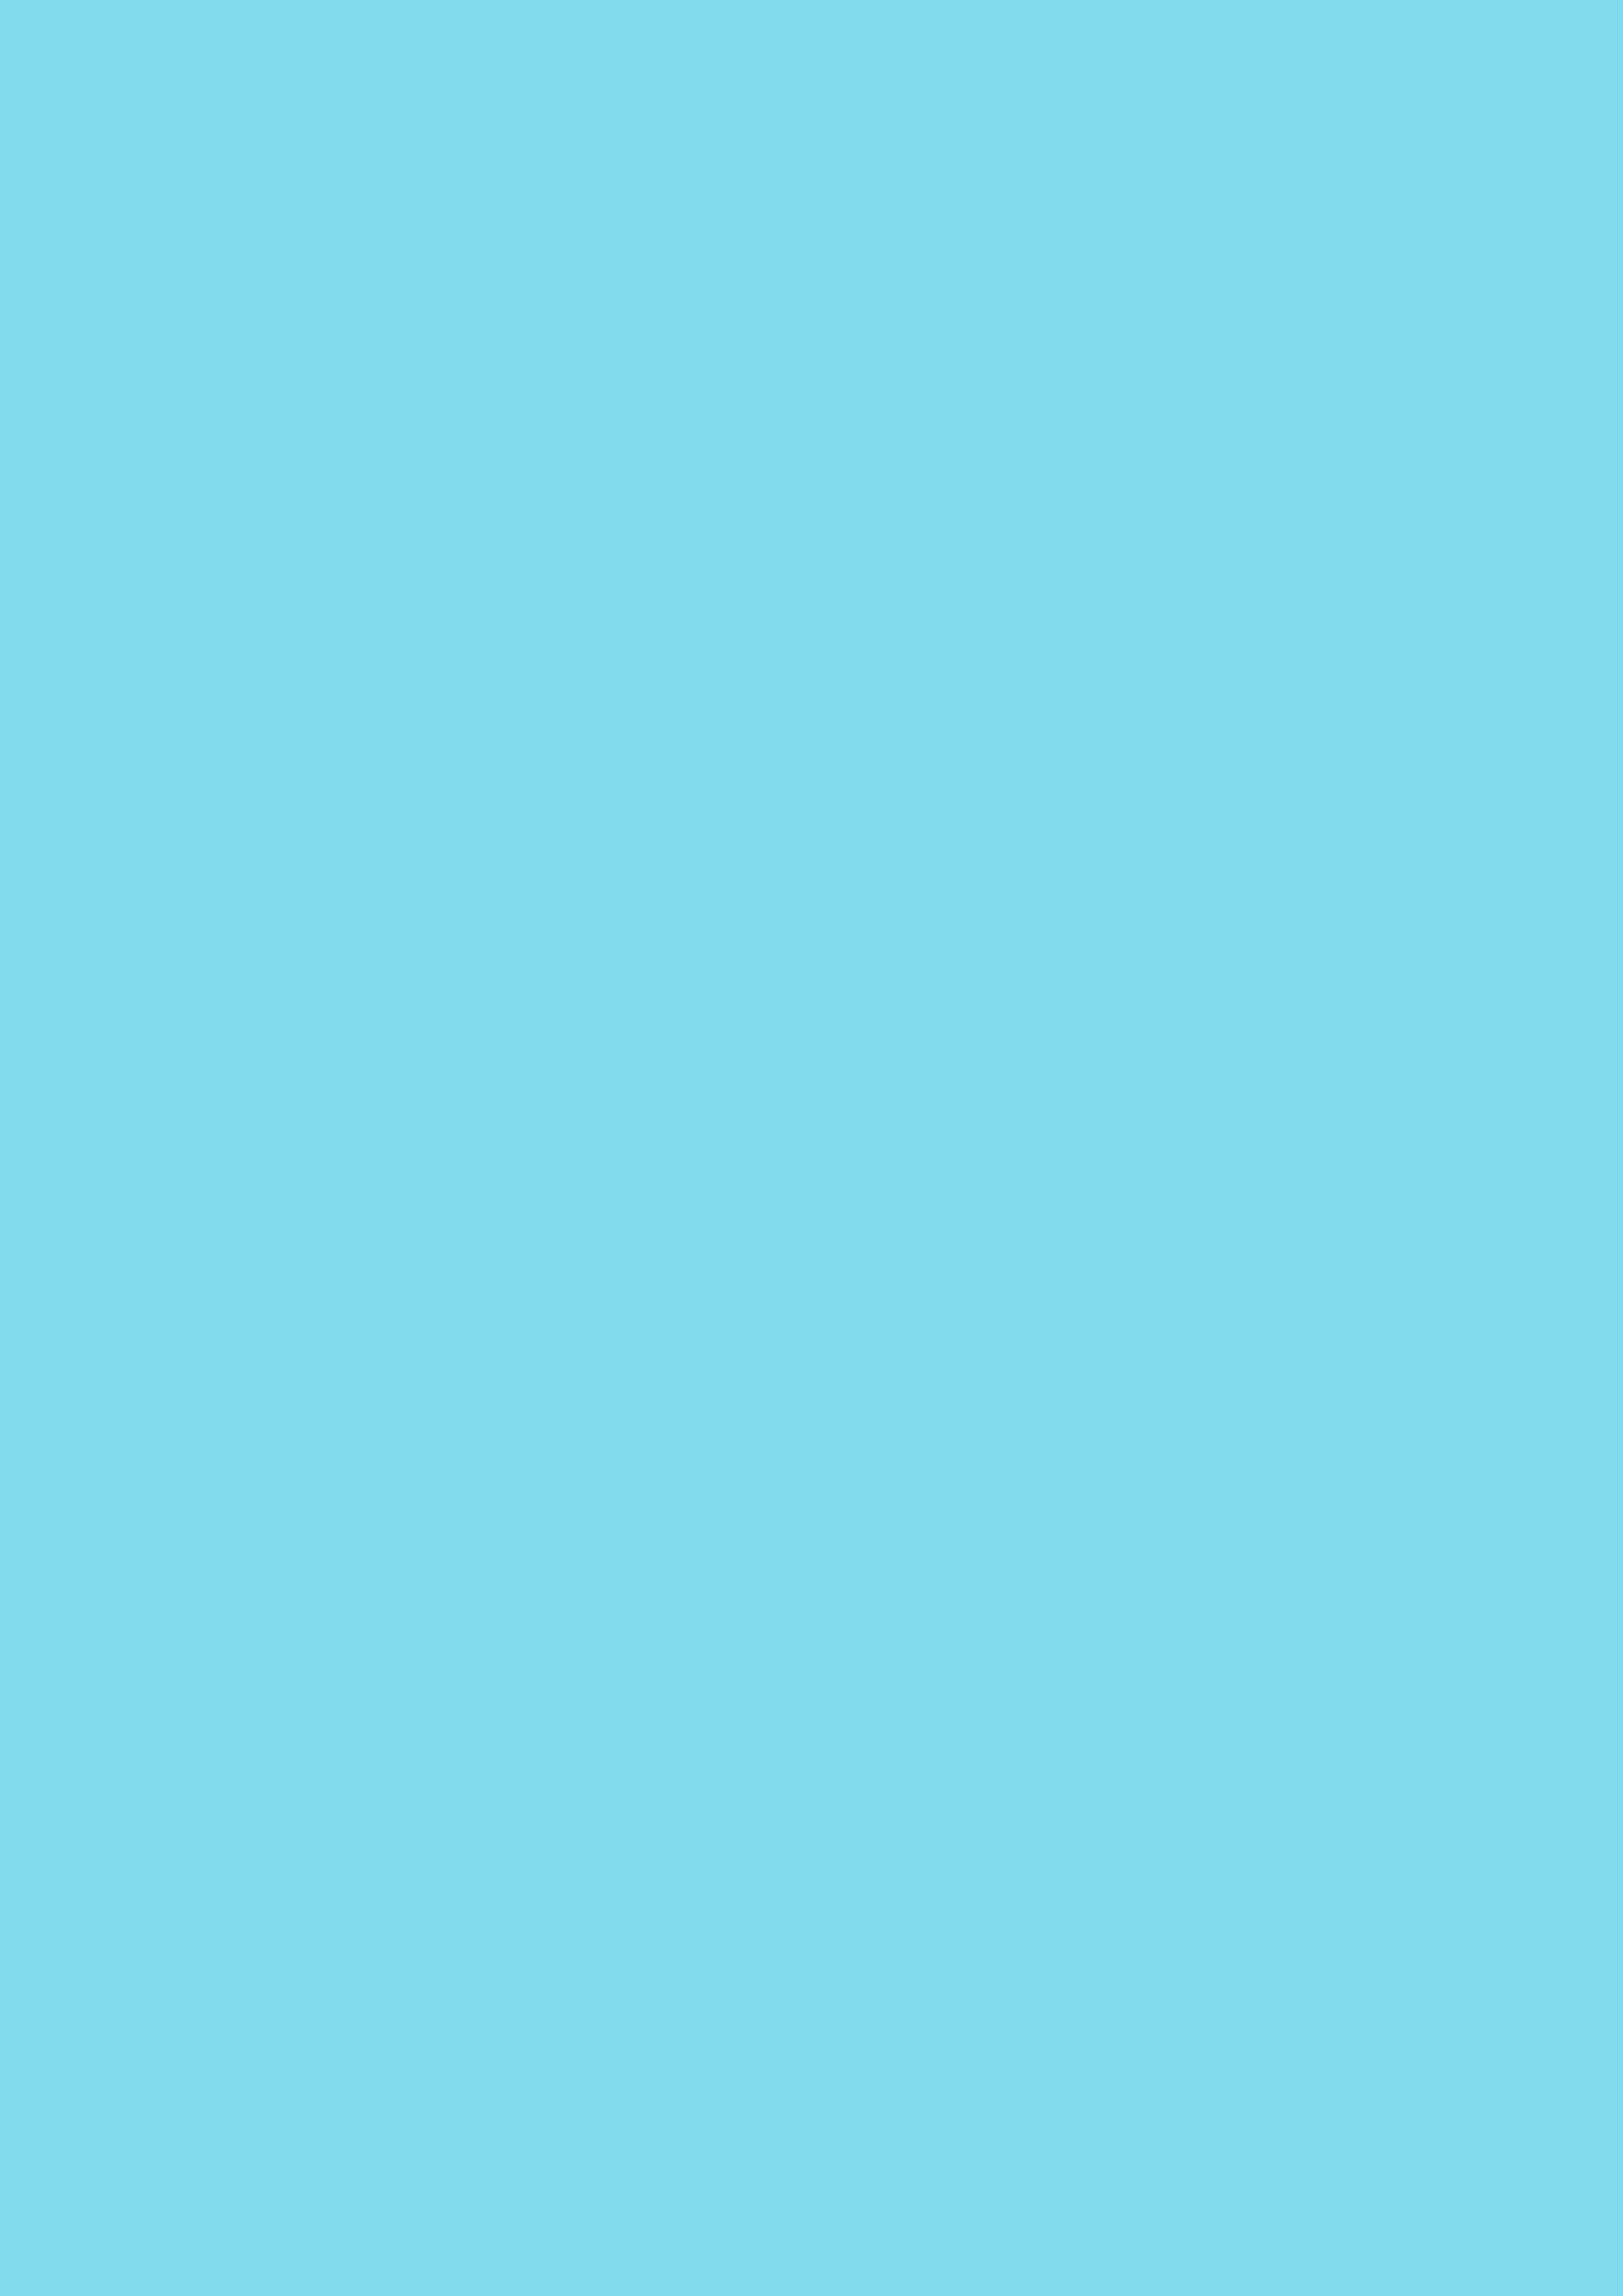 2480x3508 Medium Sky Blue Solid Color Background